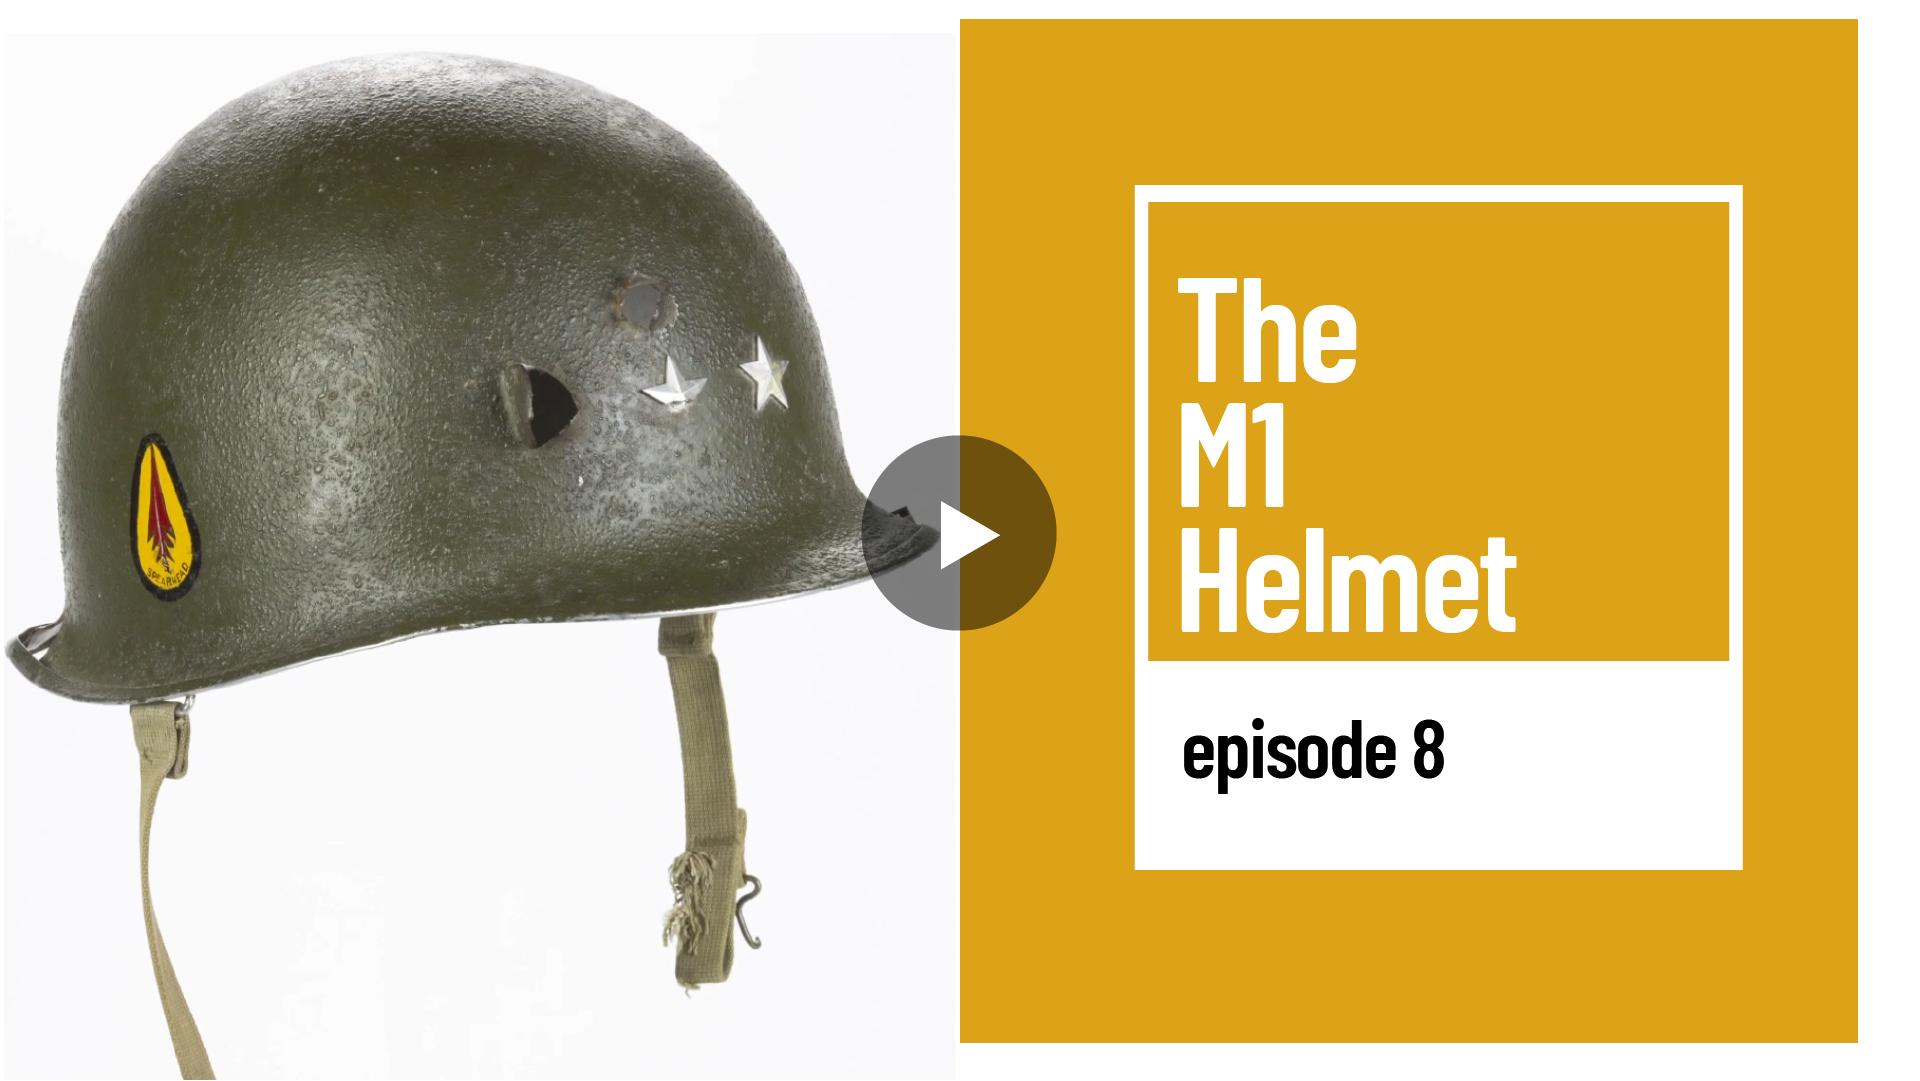 Image of The M1 Helmet